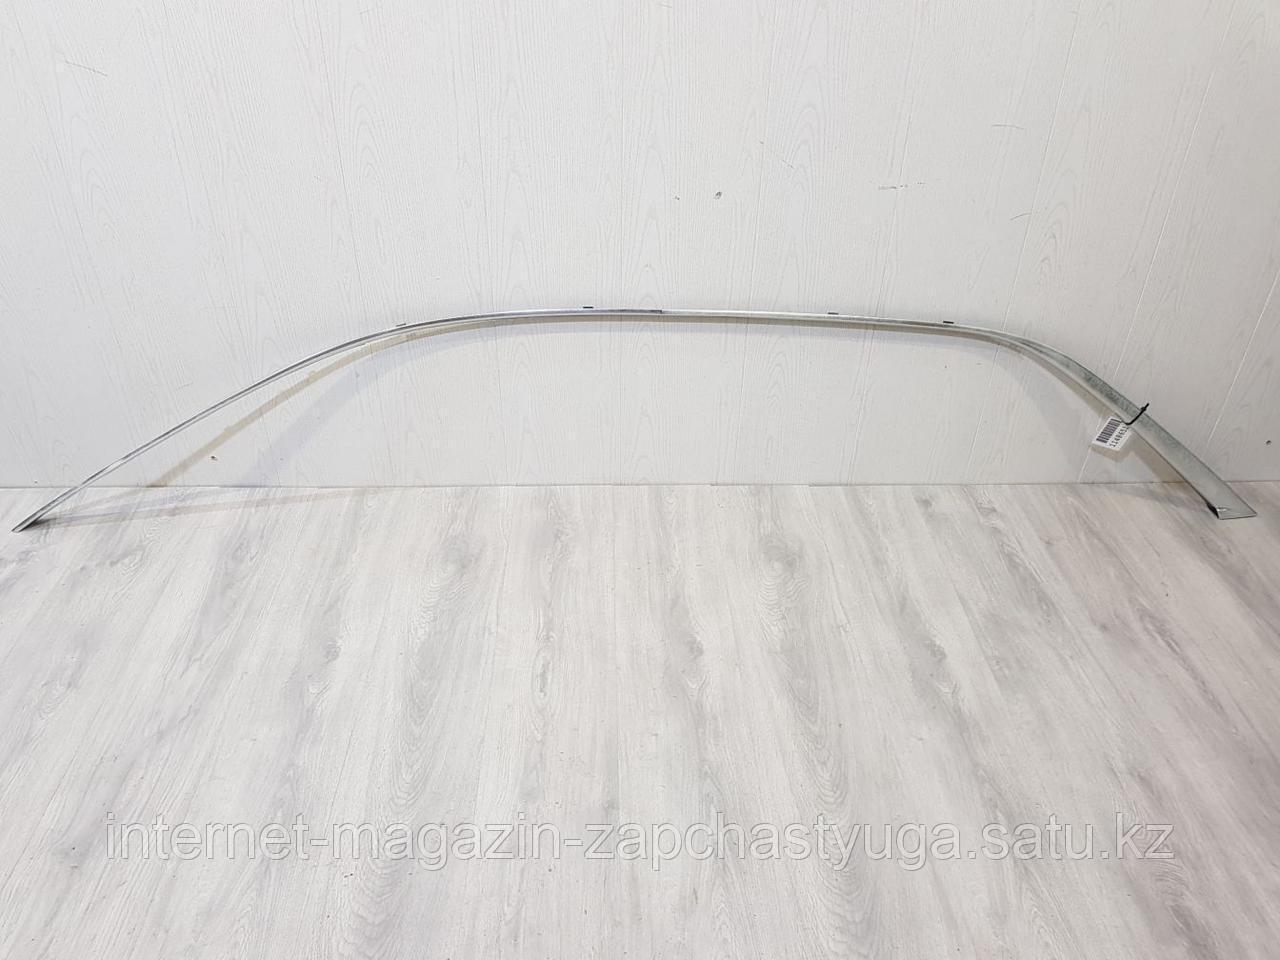 22744643 Молдинг кузова левый для Cadillac CTS 2013- Б/У - фото 1